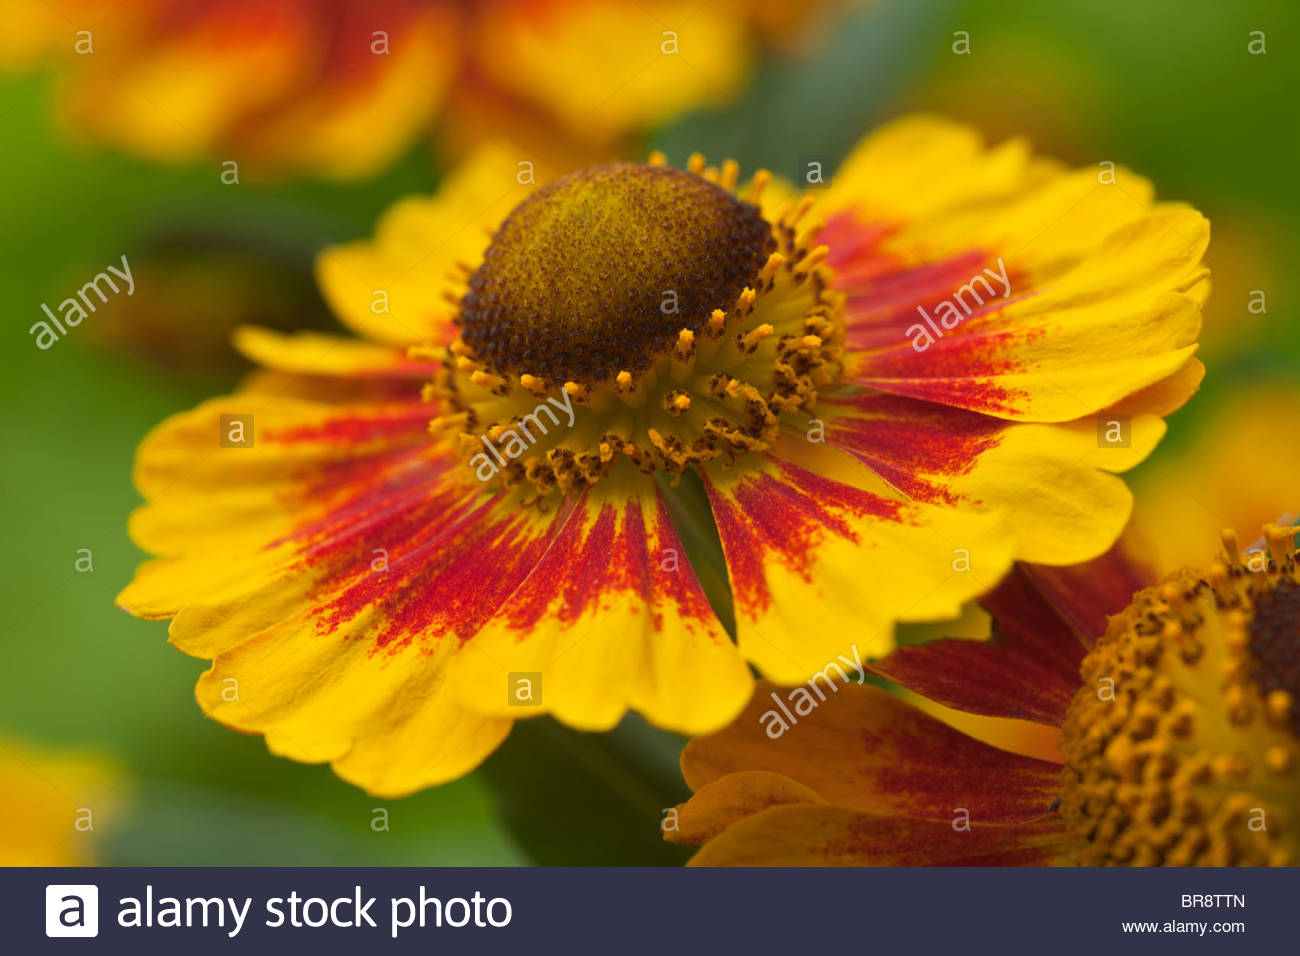 Common Sneezeweed Helenium Autumnale Summer Flower Perennial July